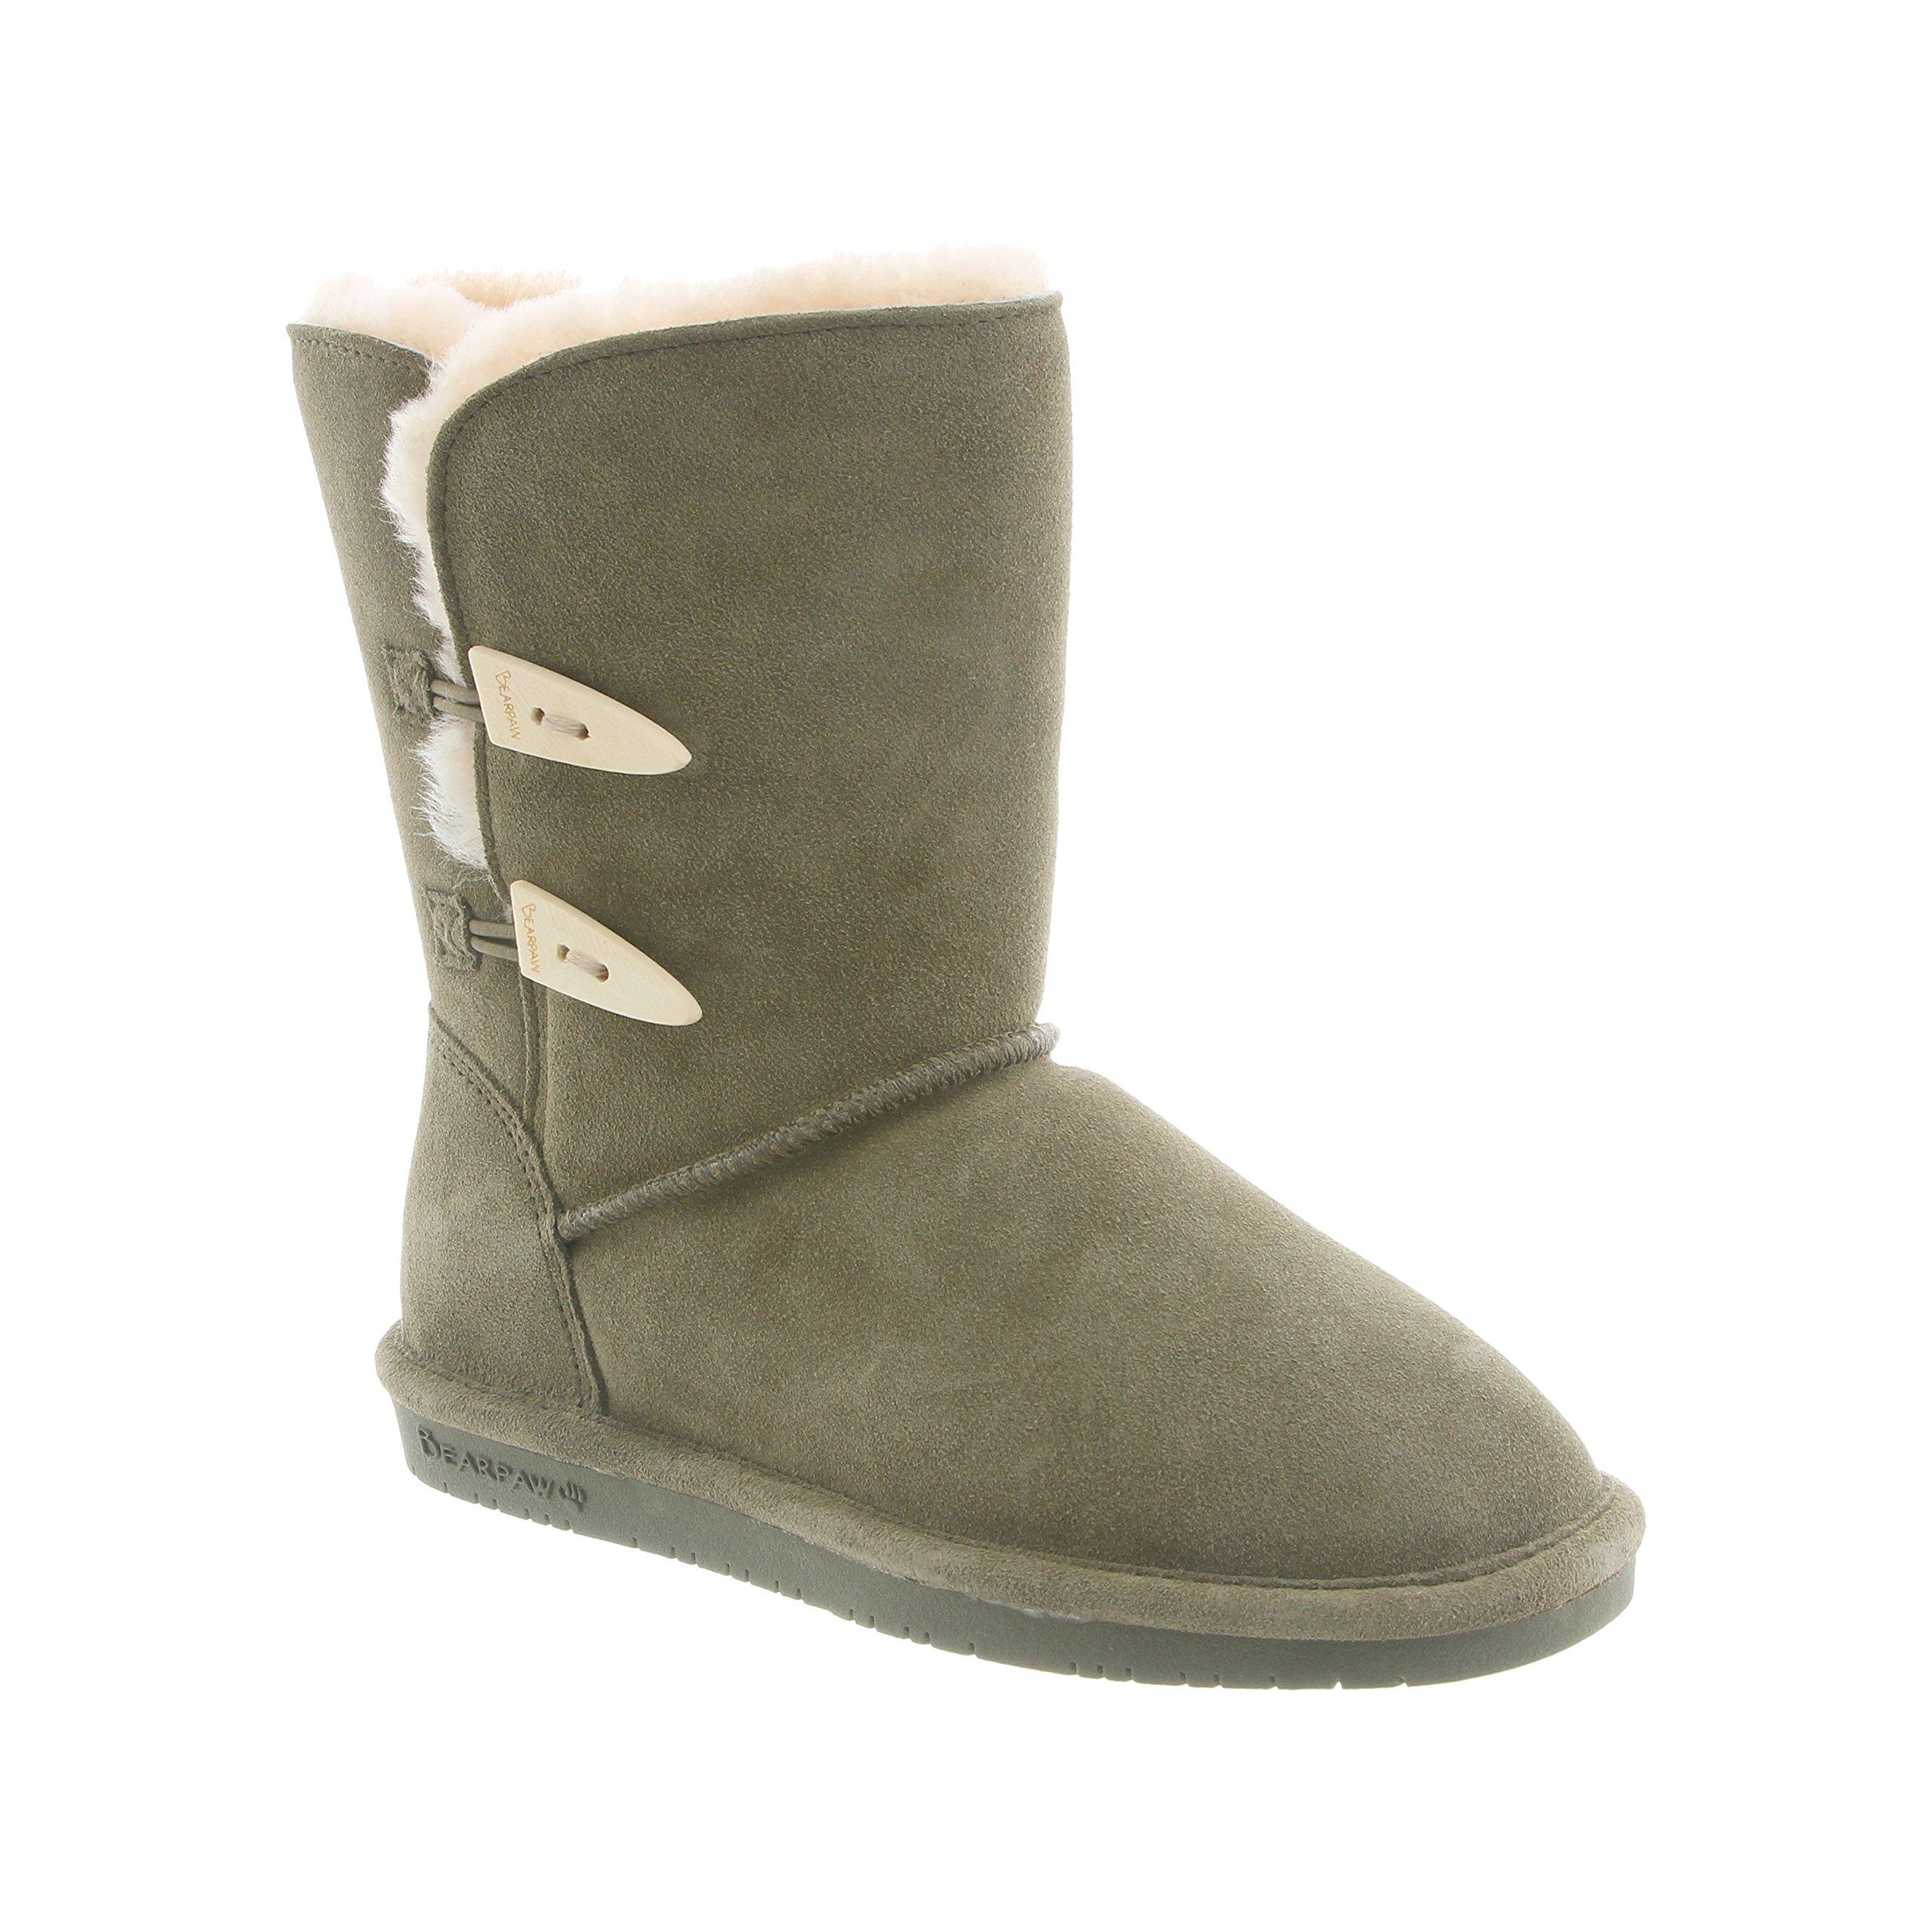 BEARPAW Women's Abigail Shearling Boots 682-W (7 B(M) US, Olive)